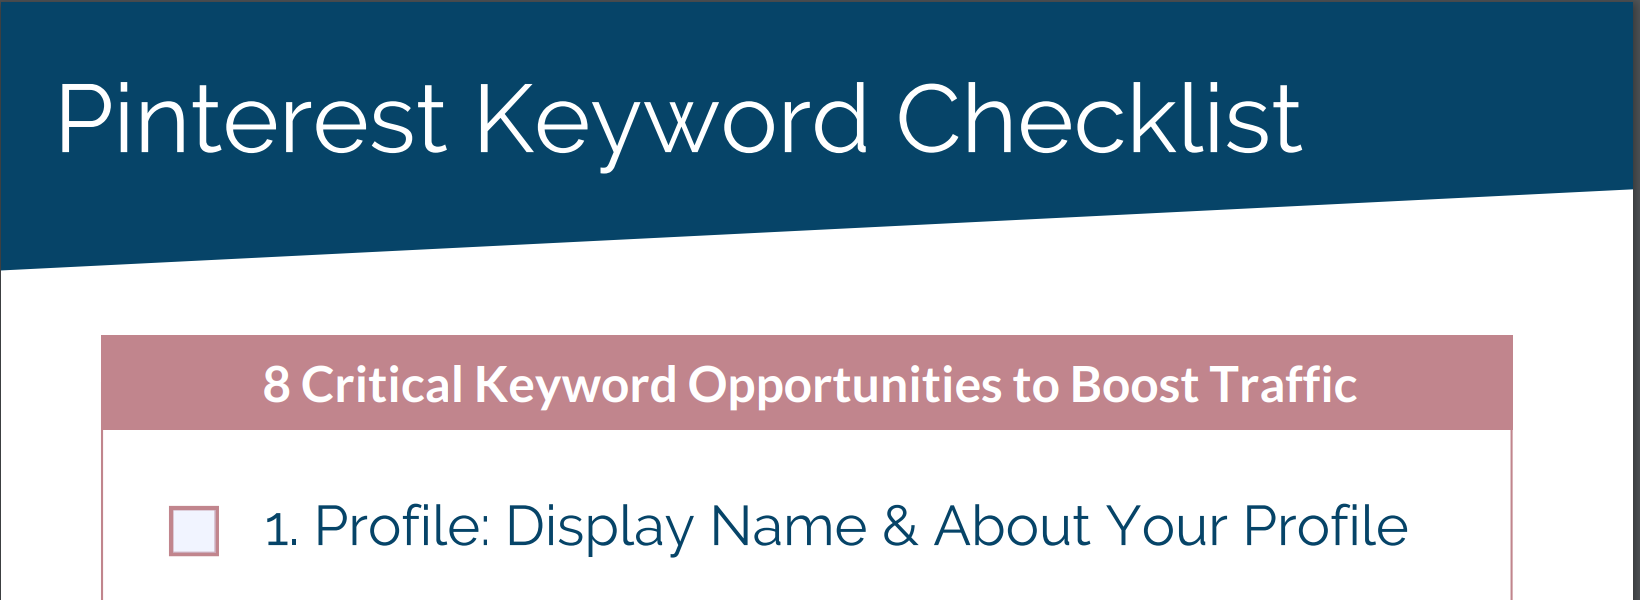 screenshot of 8 Critical Pinterest Keyword Opportunities to Boost Traffic Checklist